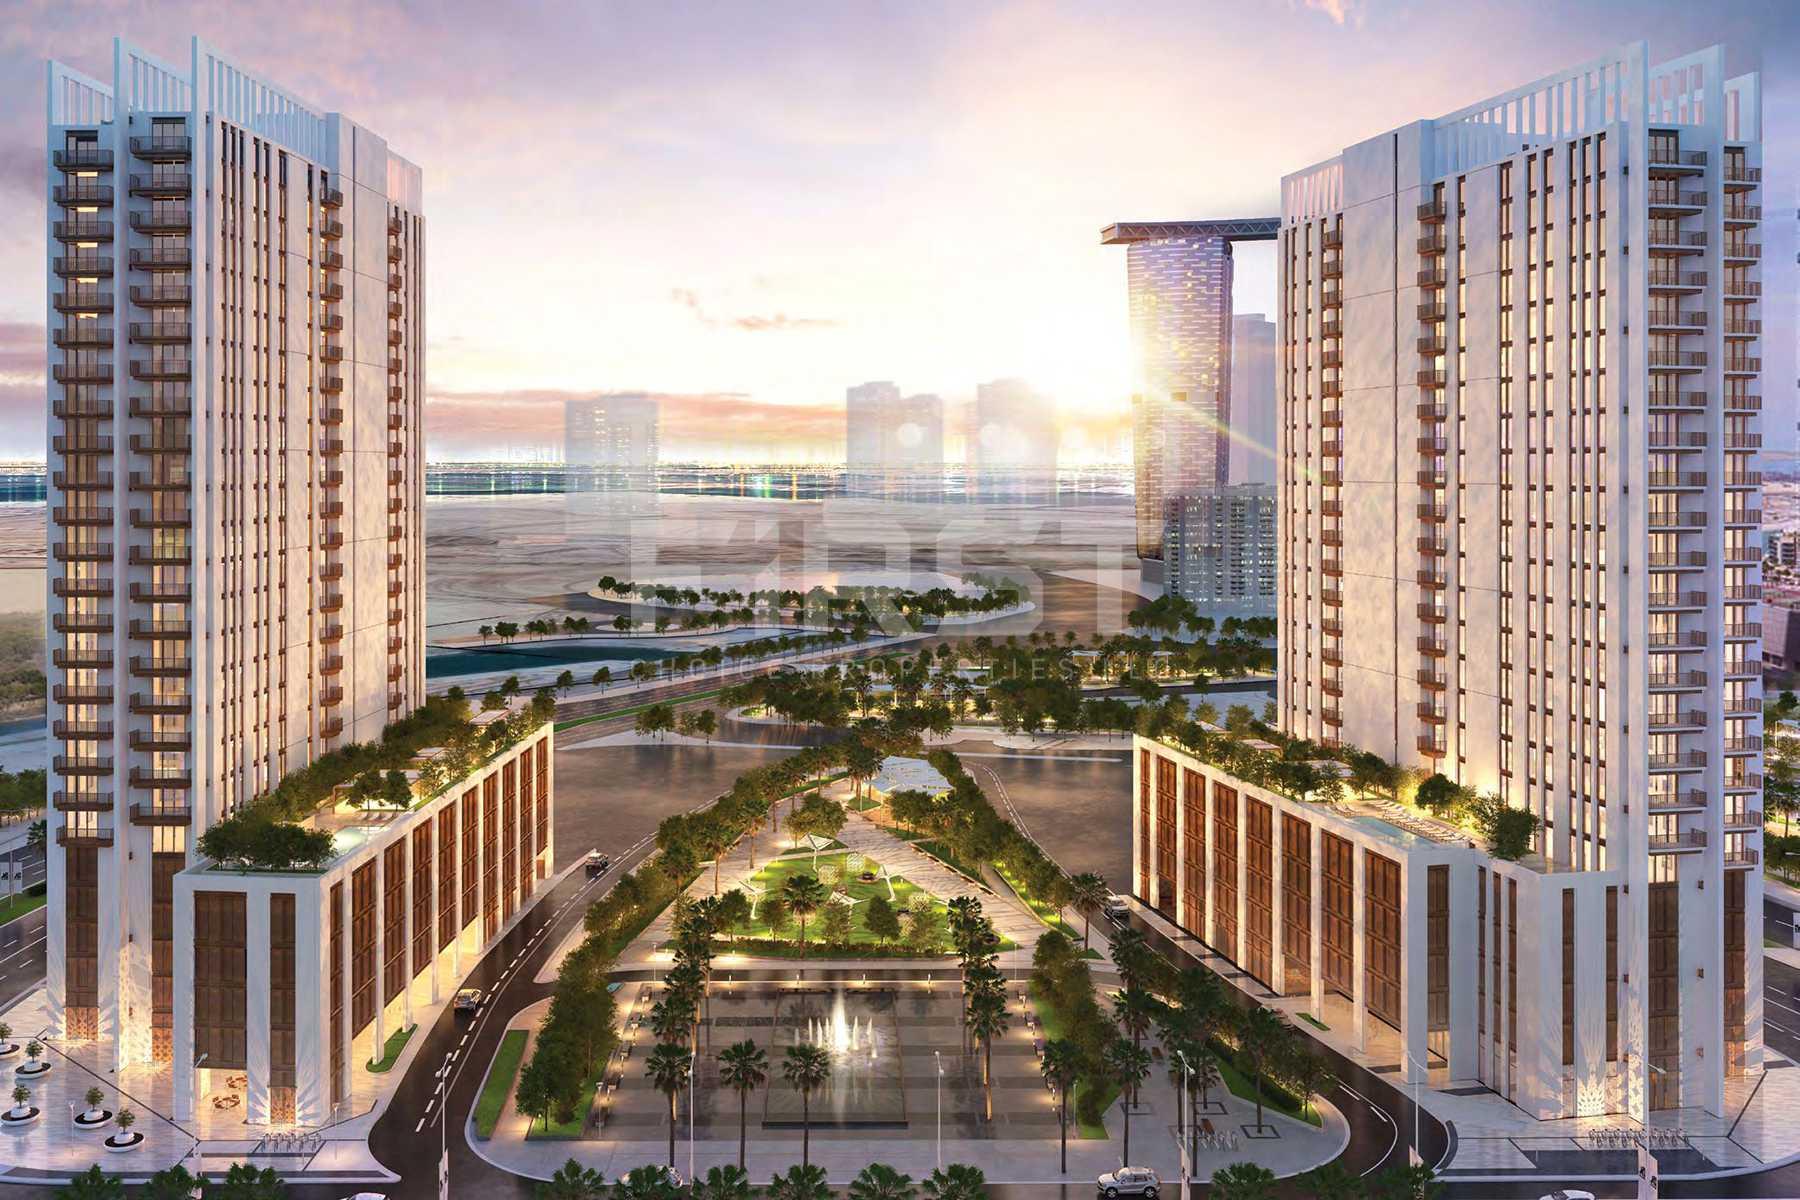 External Photo of Reflection Tower in Shams Abu Dhabi, Al Reem Island Abu Dhabi UAE (11).jpg